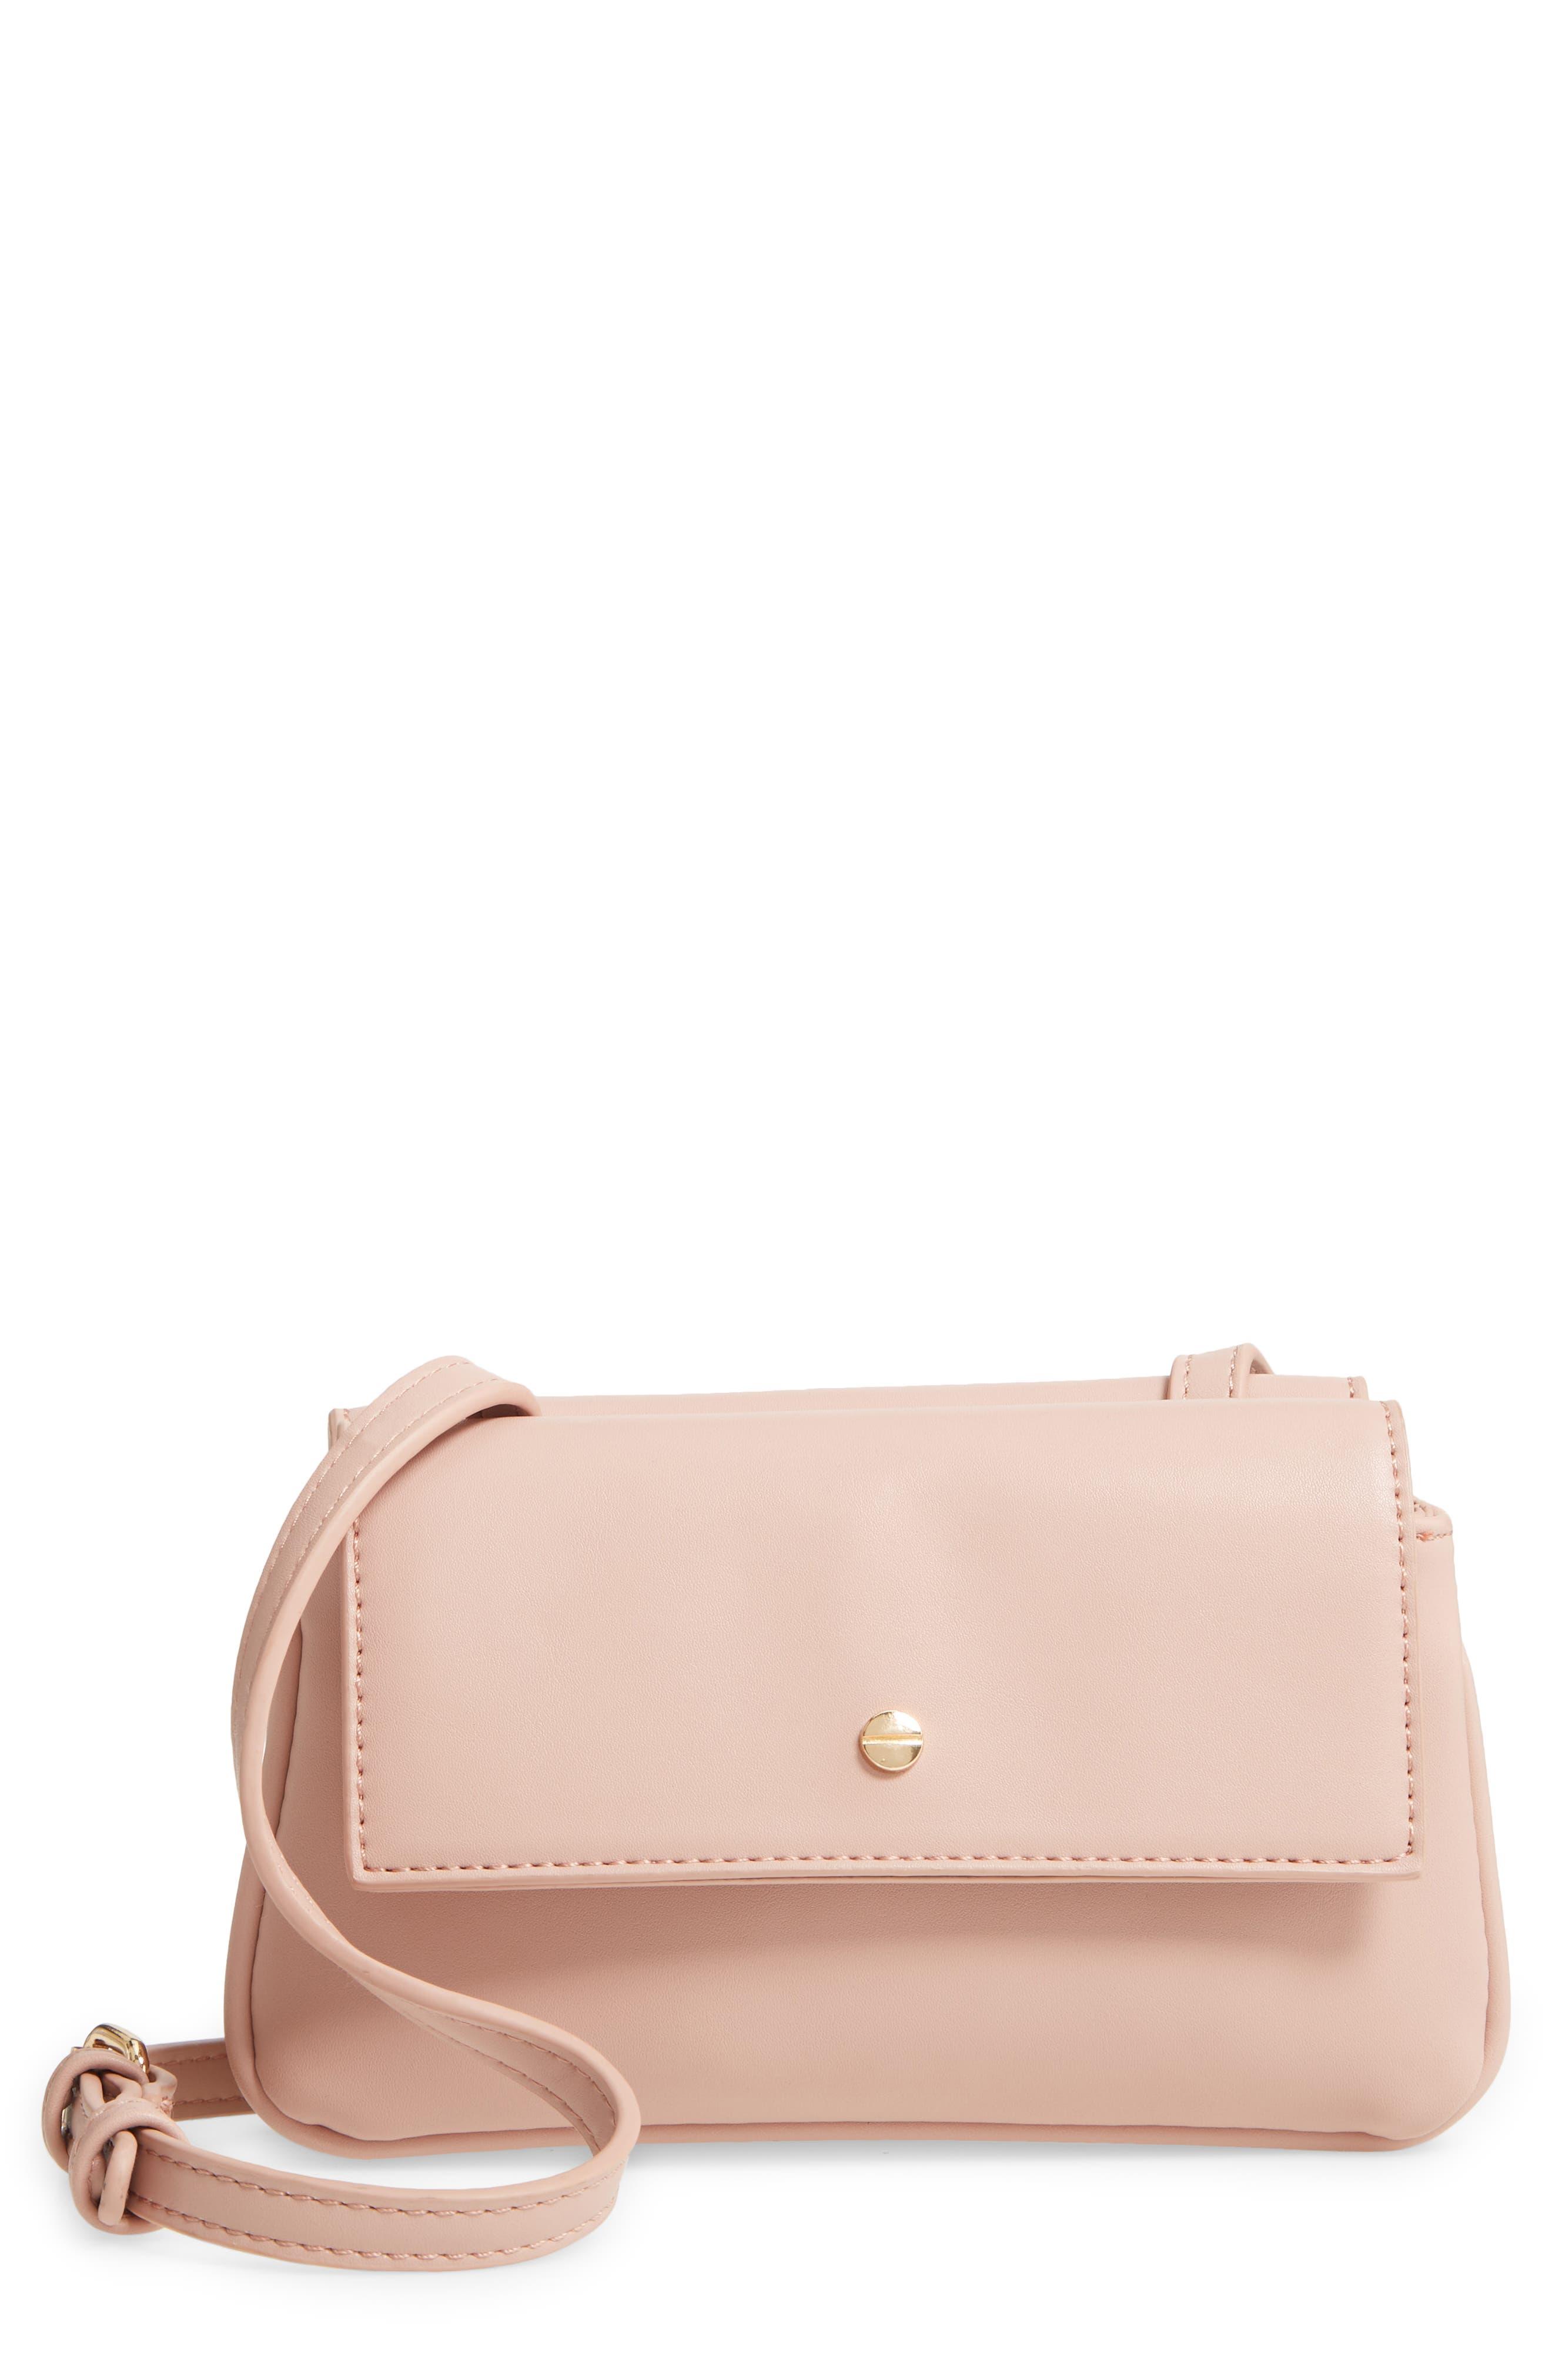 Mali + Lili Double Flap Vegan Leather Crossbody Bag